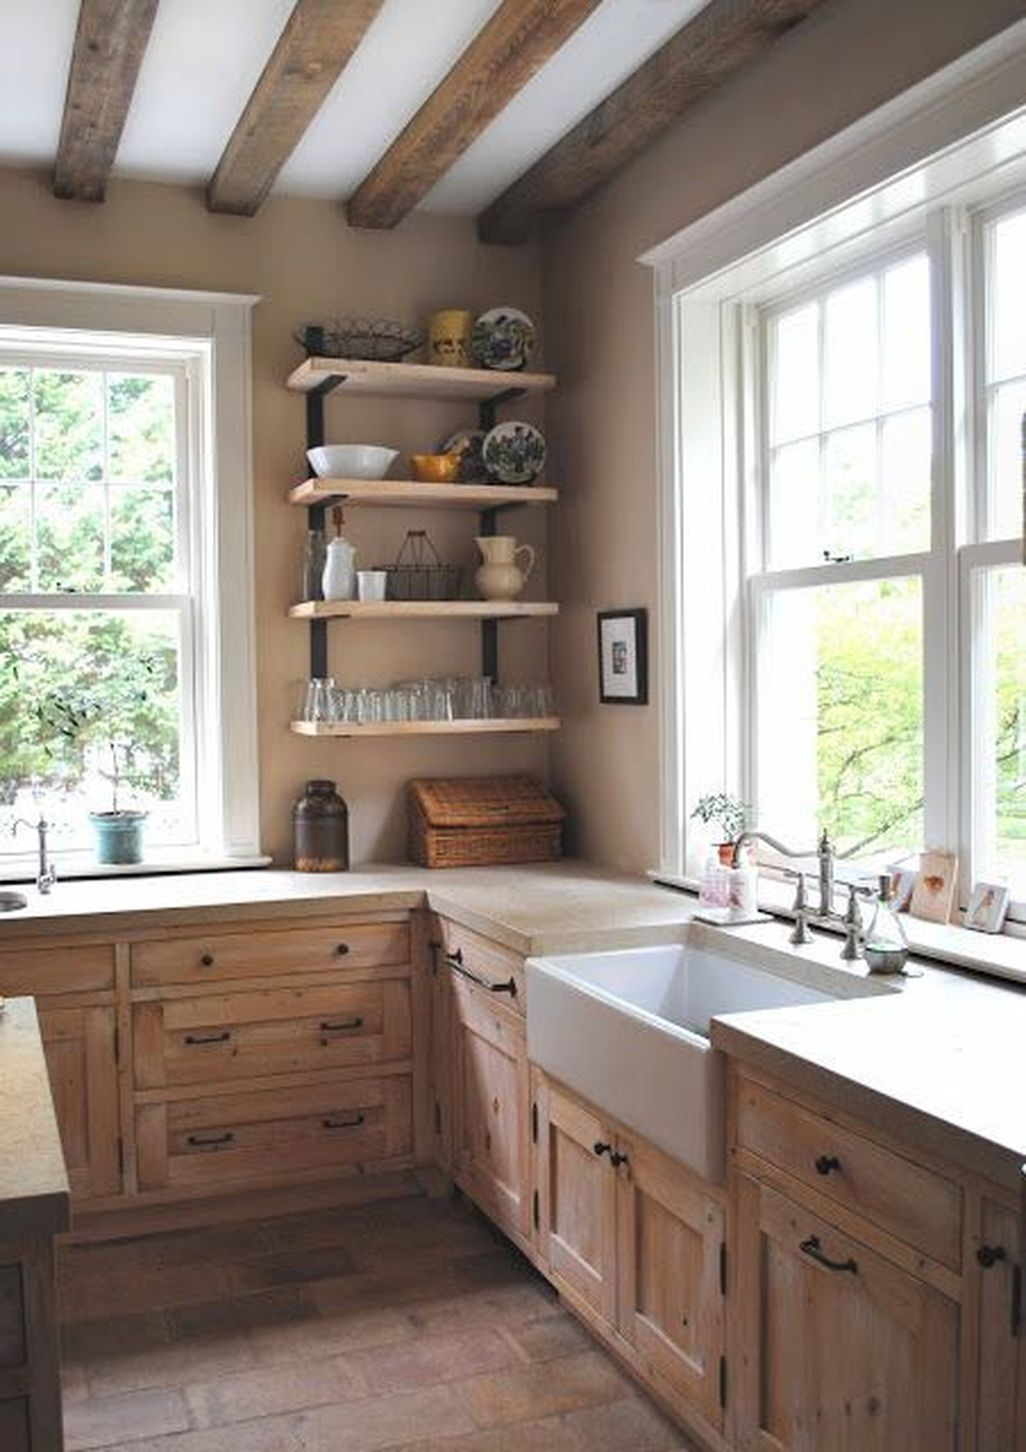 49 Stylish Rustic Kitchen Decor Open Shelves Ideas